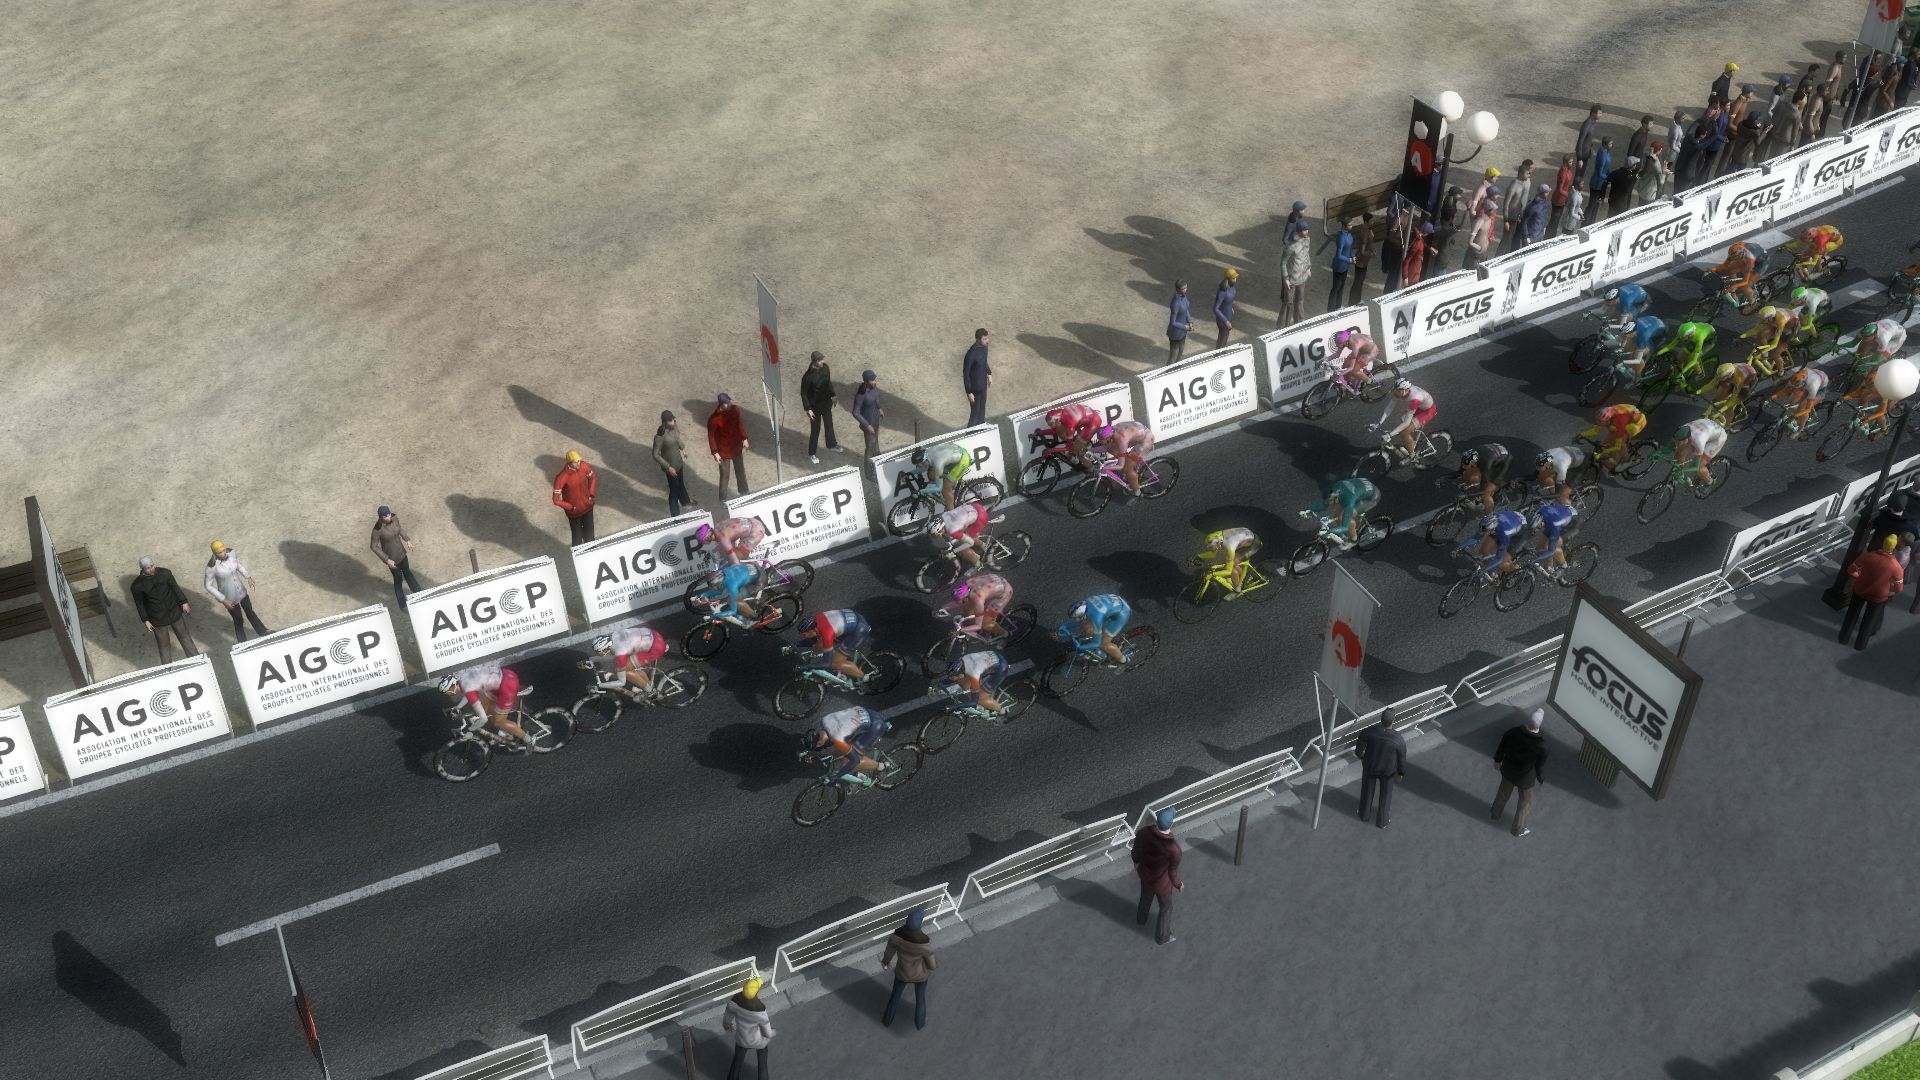 pcmdaily.com/images/mg/2019/Races/PT/Qatar/mg19_qat_s05_12.jpg